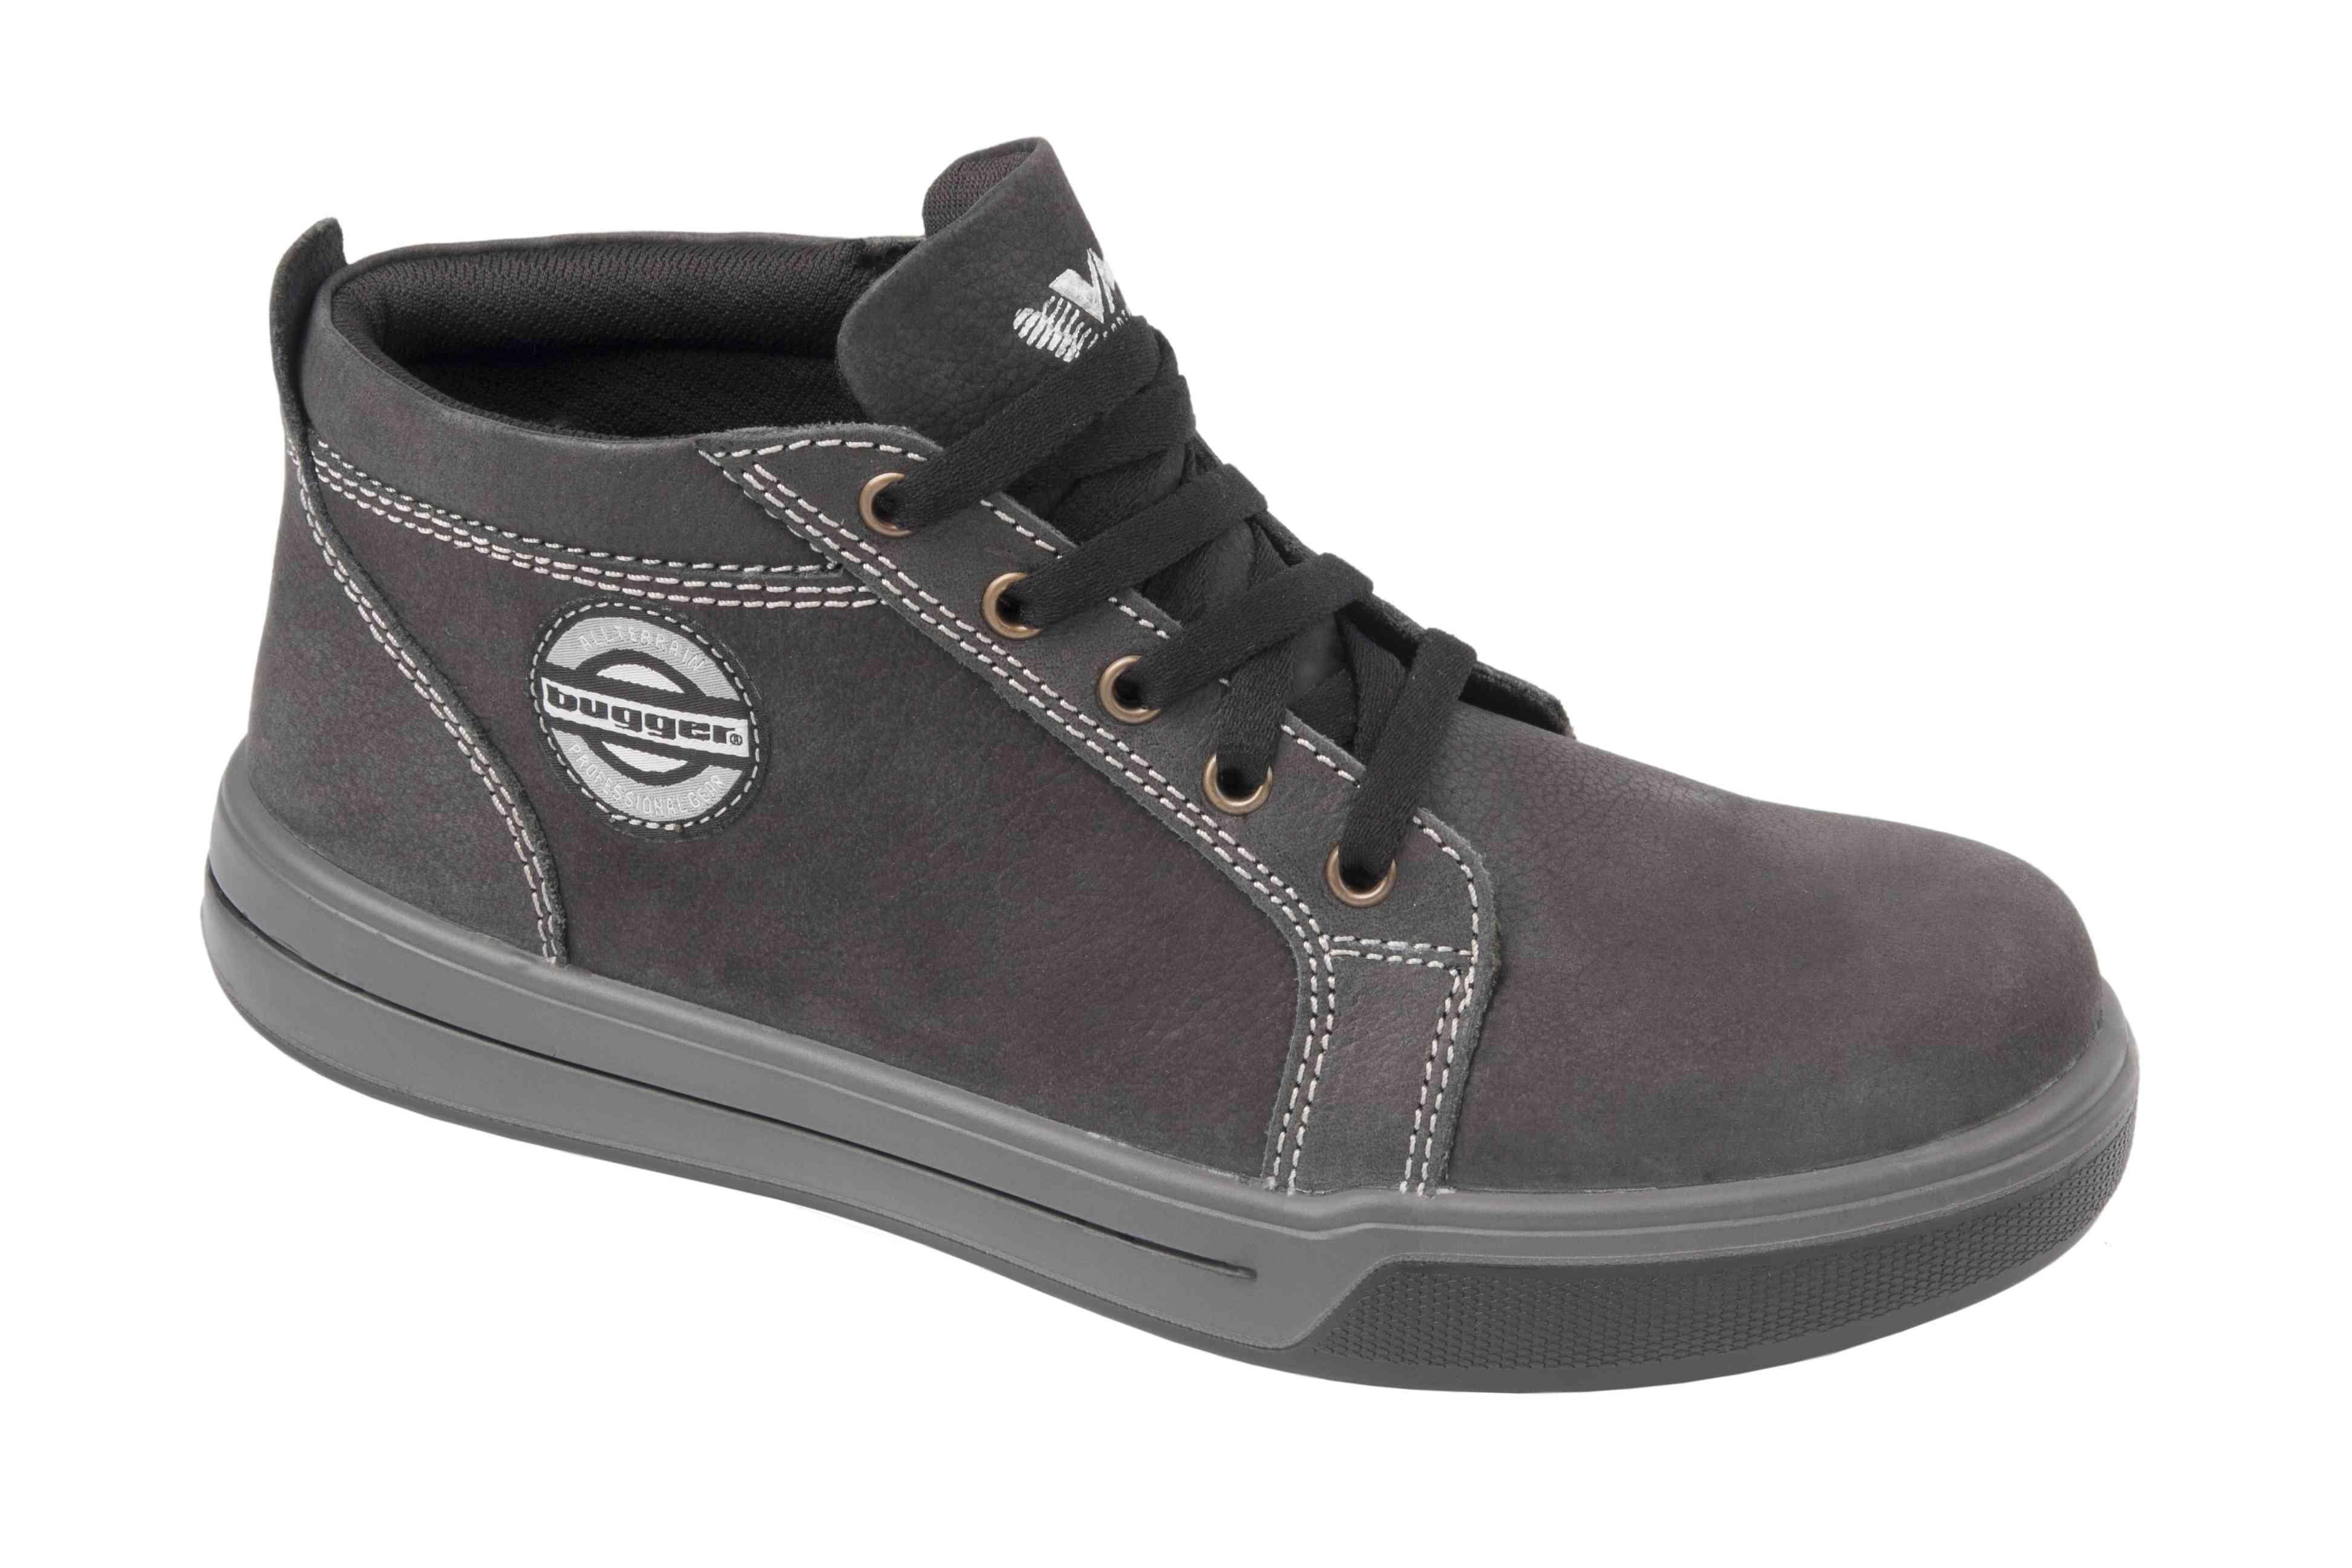 d2f864d45a705 Poločlenková obuv s oceľovou špicou MADISON S1